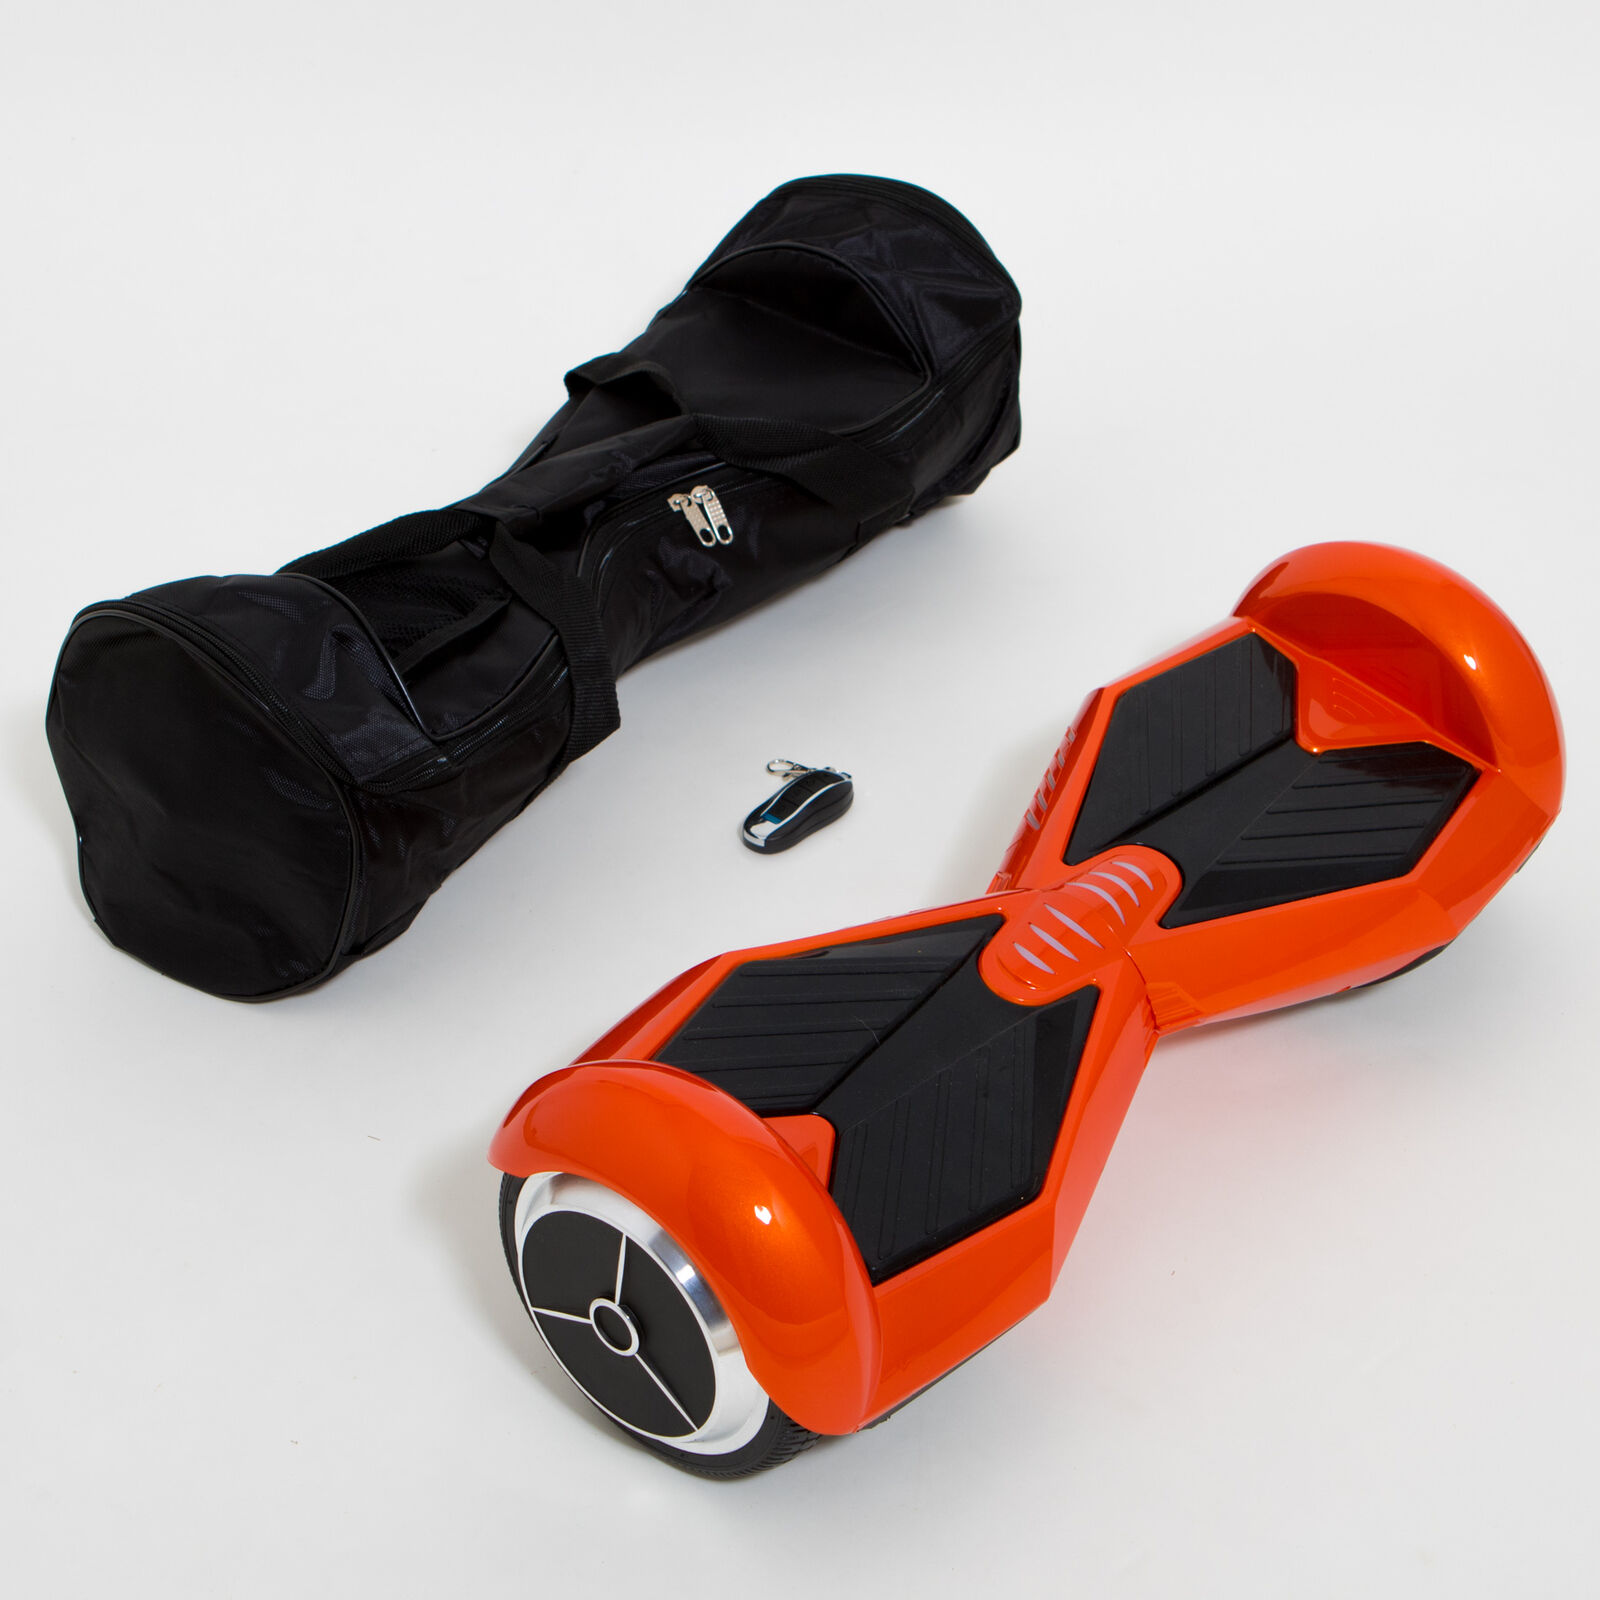 Hovertavola Balance Scooter Ruote 6.5 Rosso  Sacca Zaino